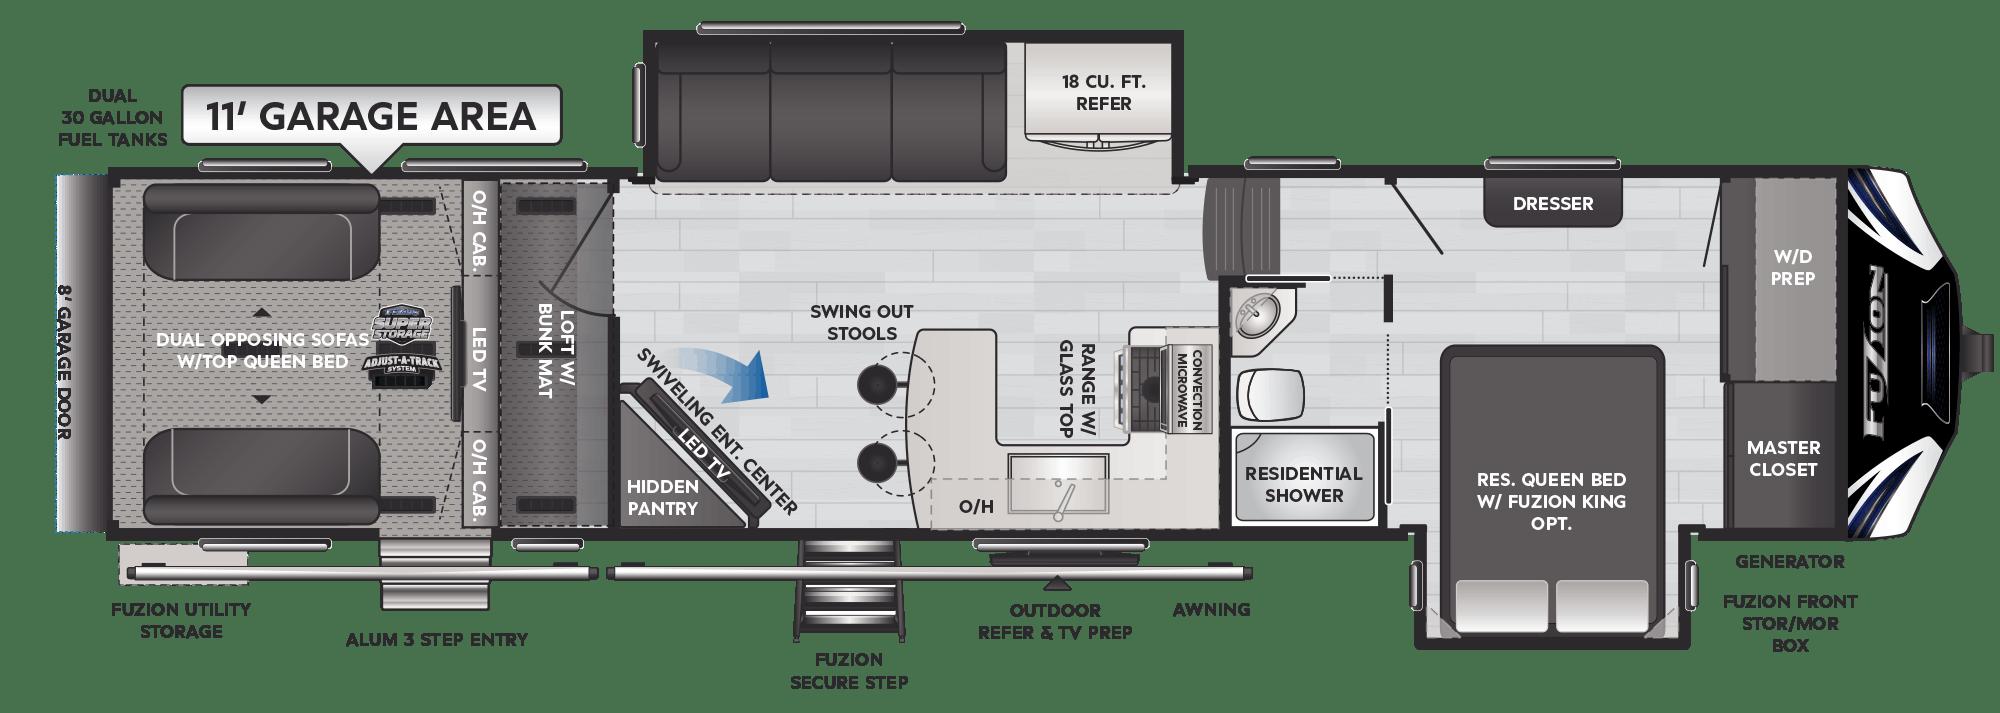 Floor Plan: 2021 Fuzion 369